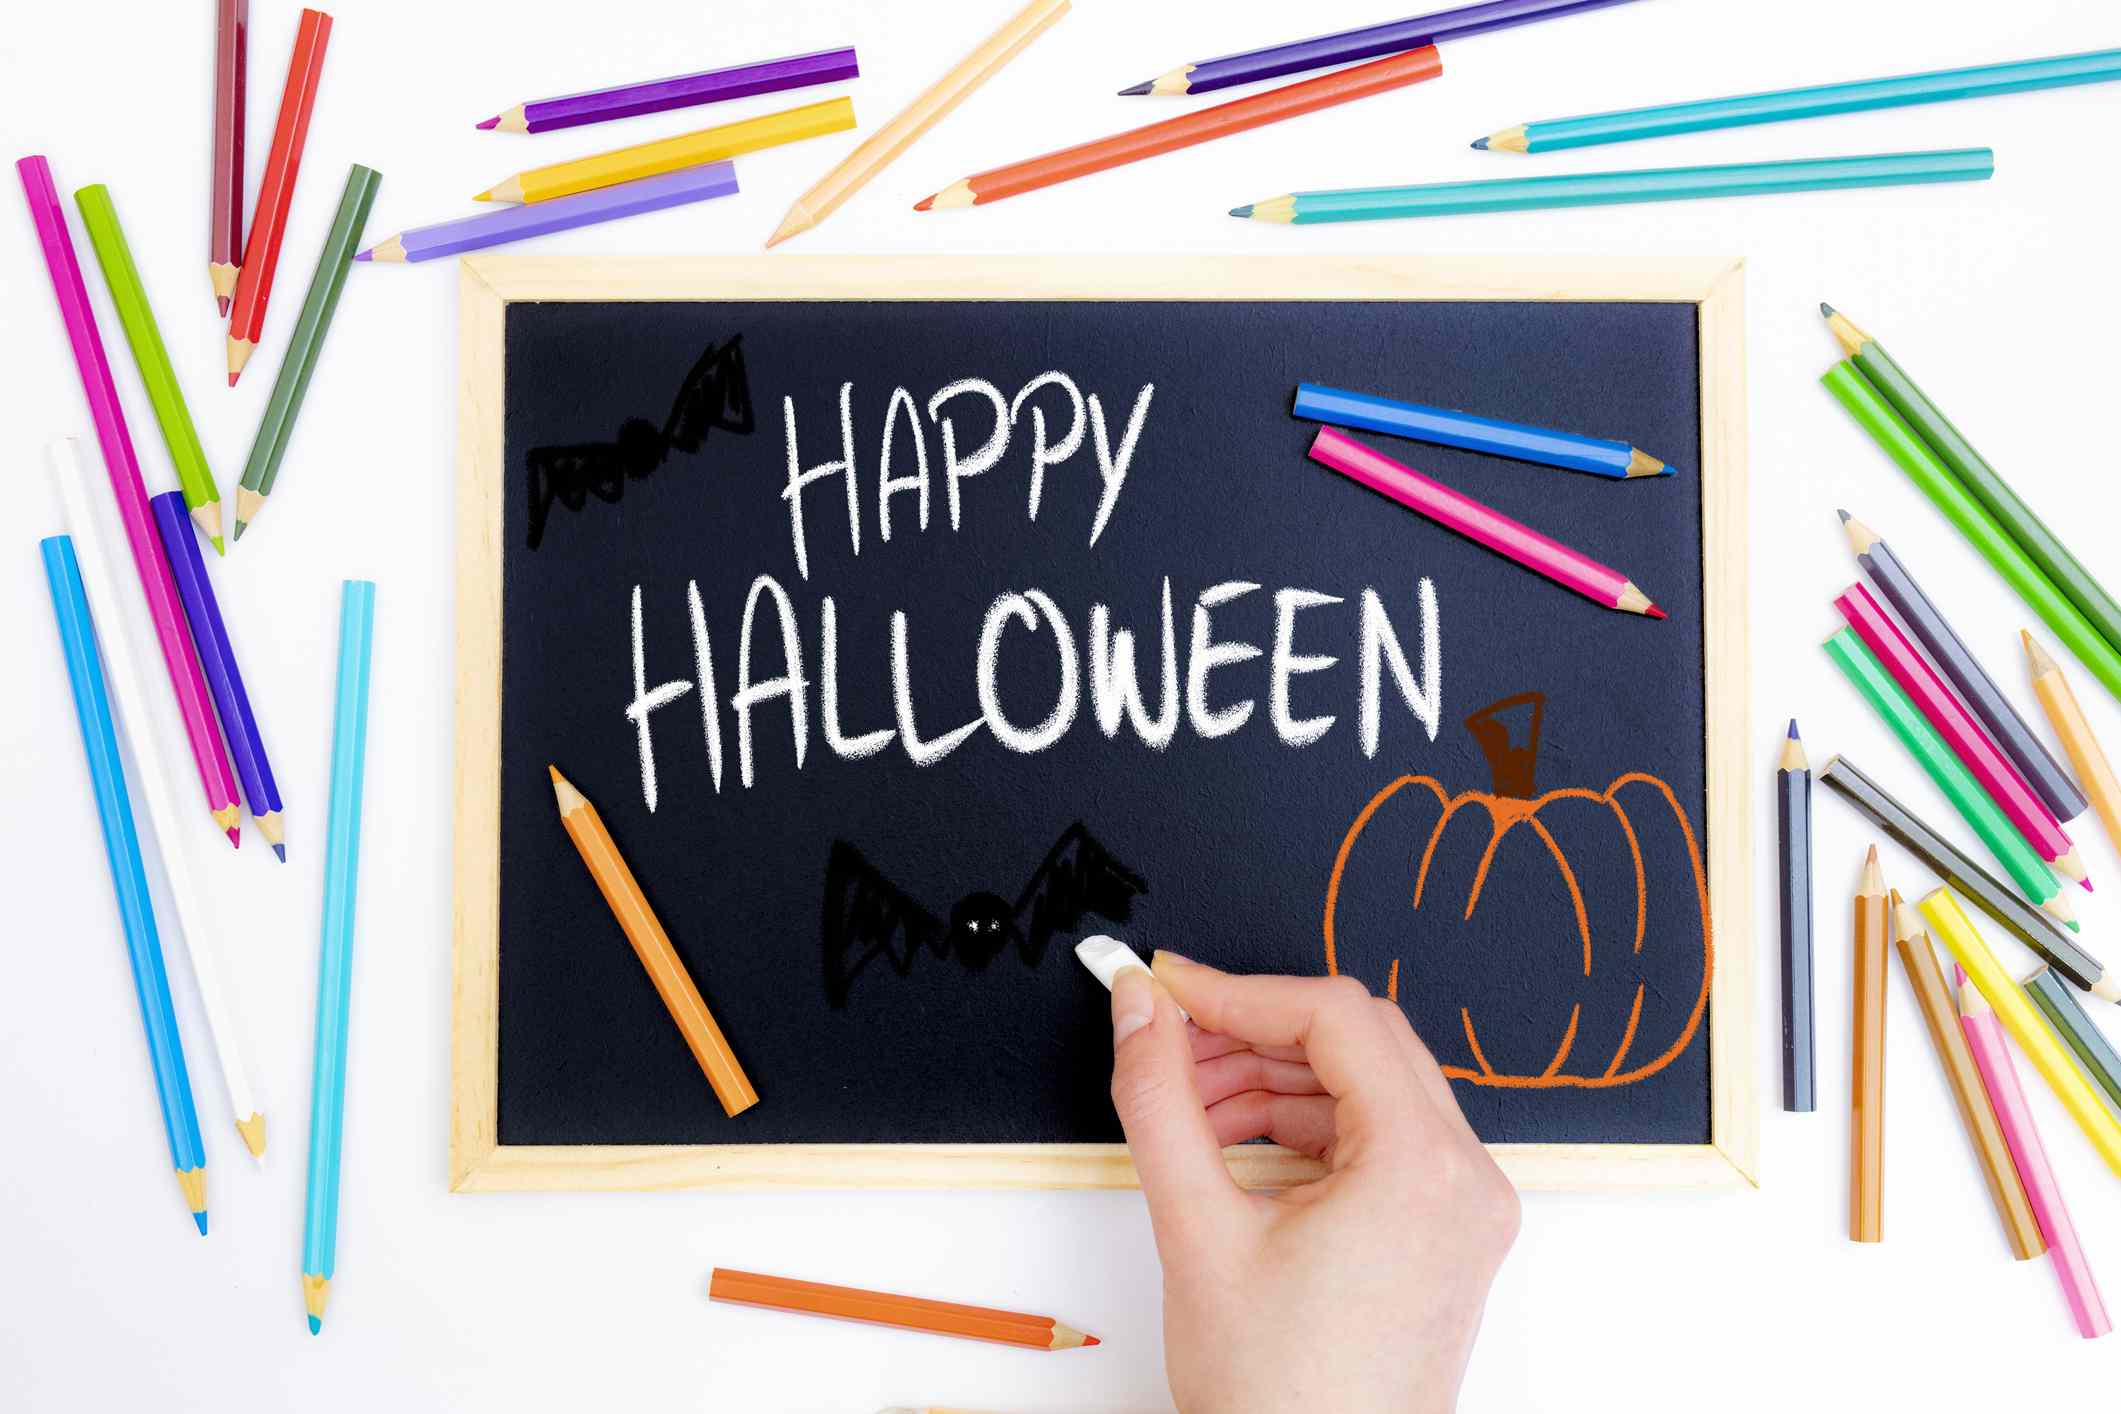 Hand drawing Halloween wishes black board